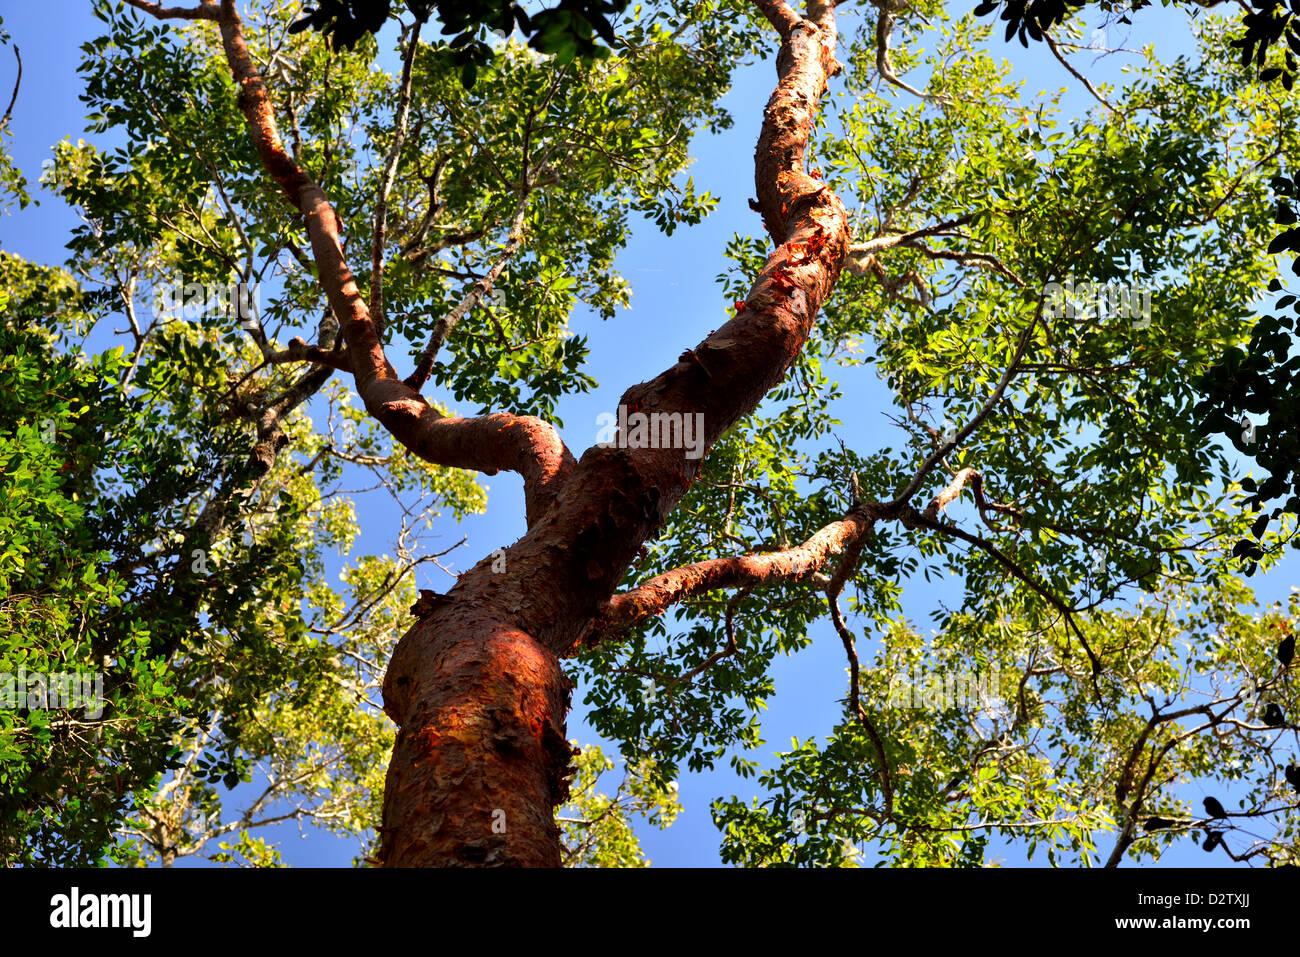 A Gumbo Limbo (Bursera simaruba) tree with red barks. The Everglades National Park, Florida, USA. - Stock Image